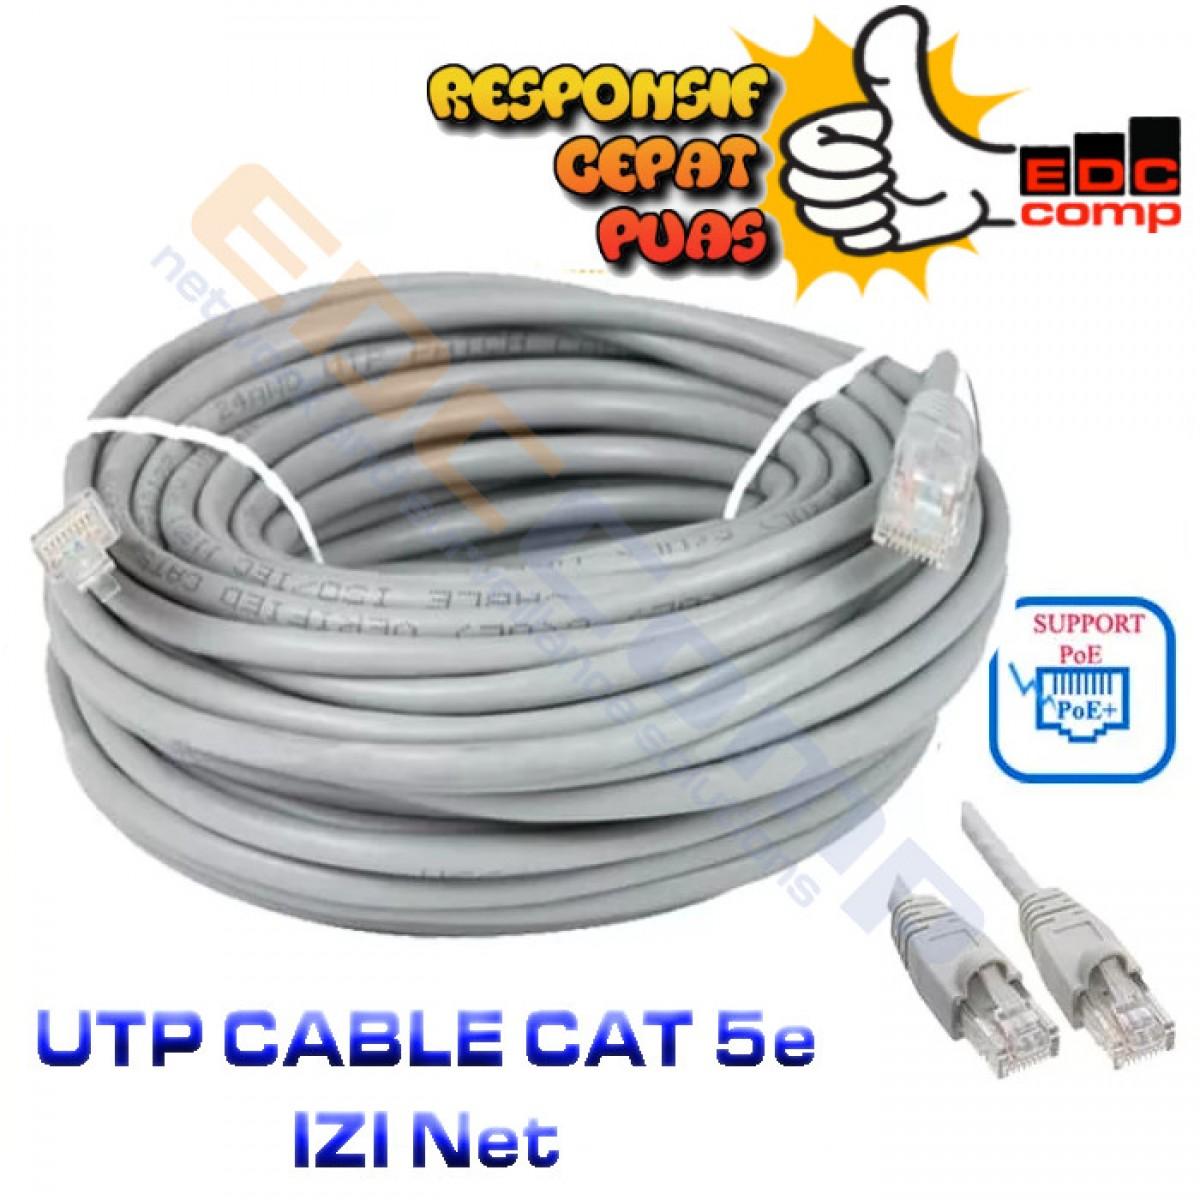 UTP Cable IZINET Cat5E 55 Meter - EdcComp